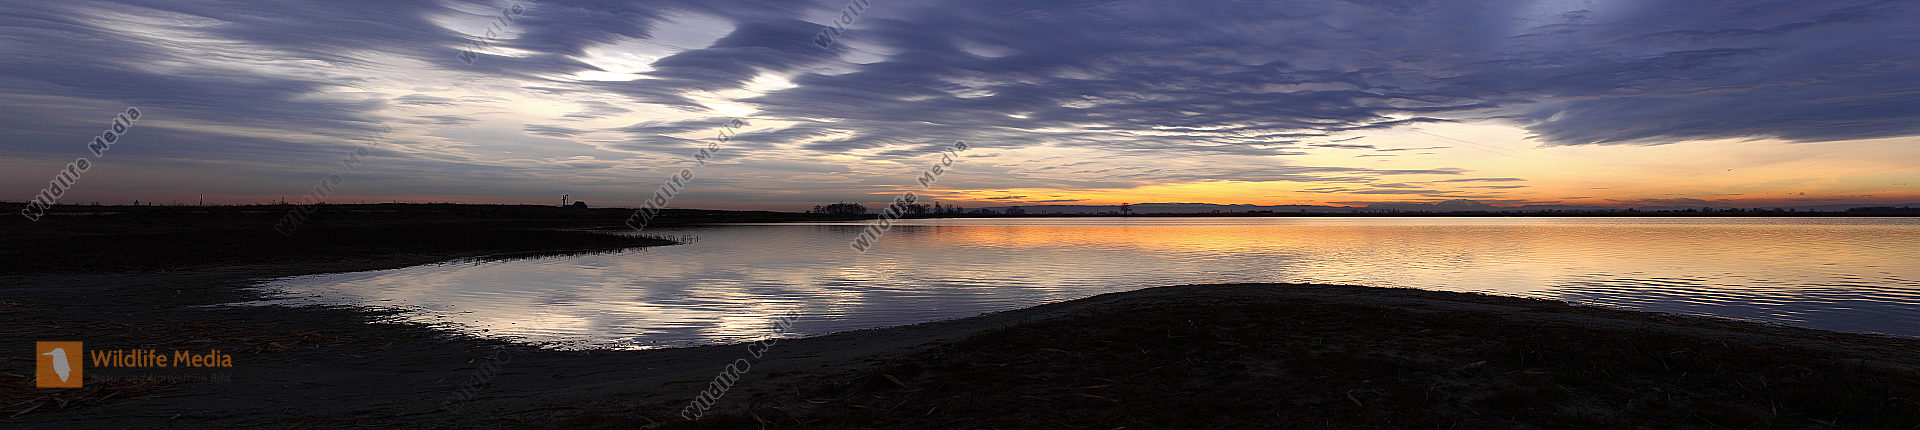 Seewinkel Panoramabild